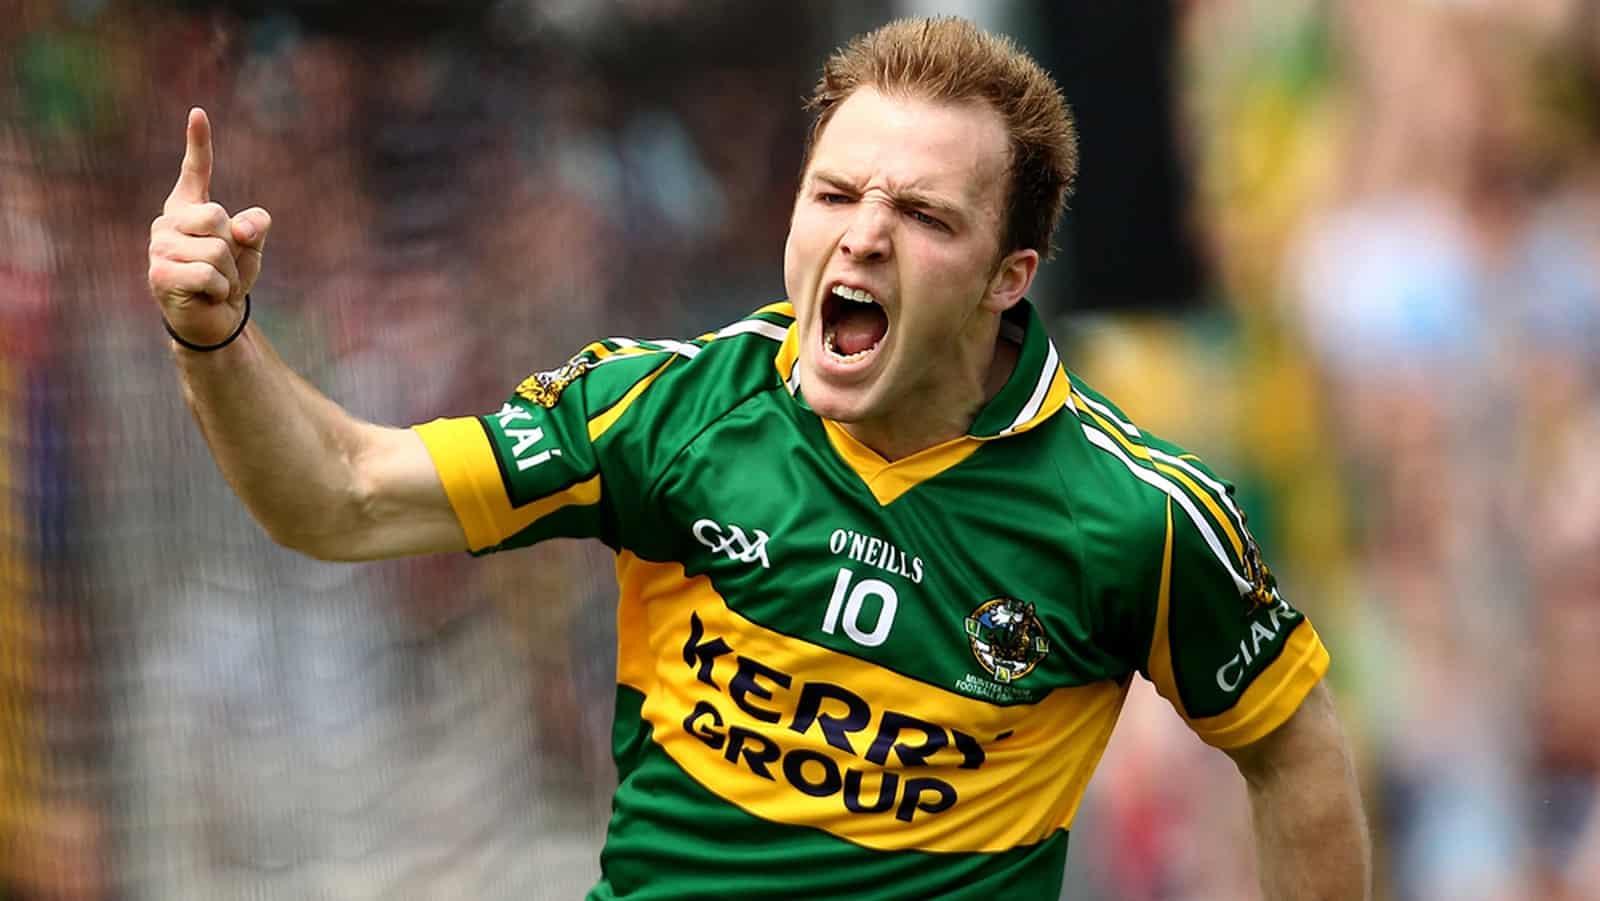 Darran O'Sullivan Announces his Retirement